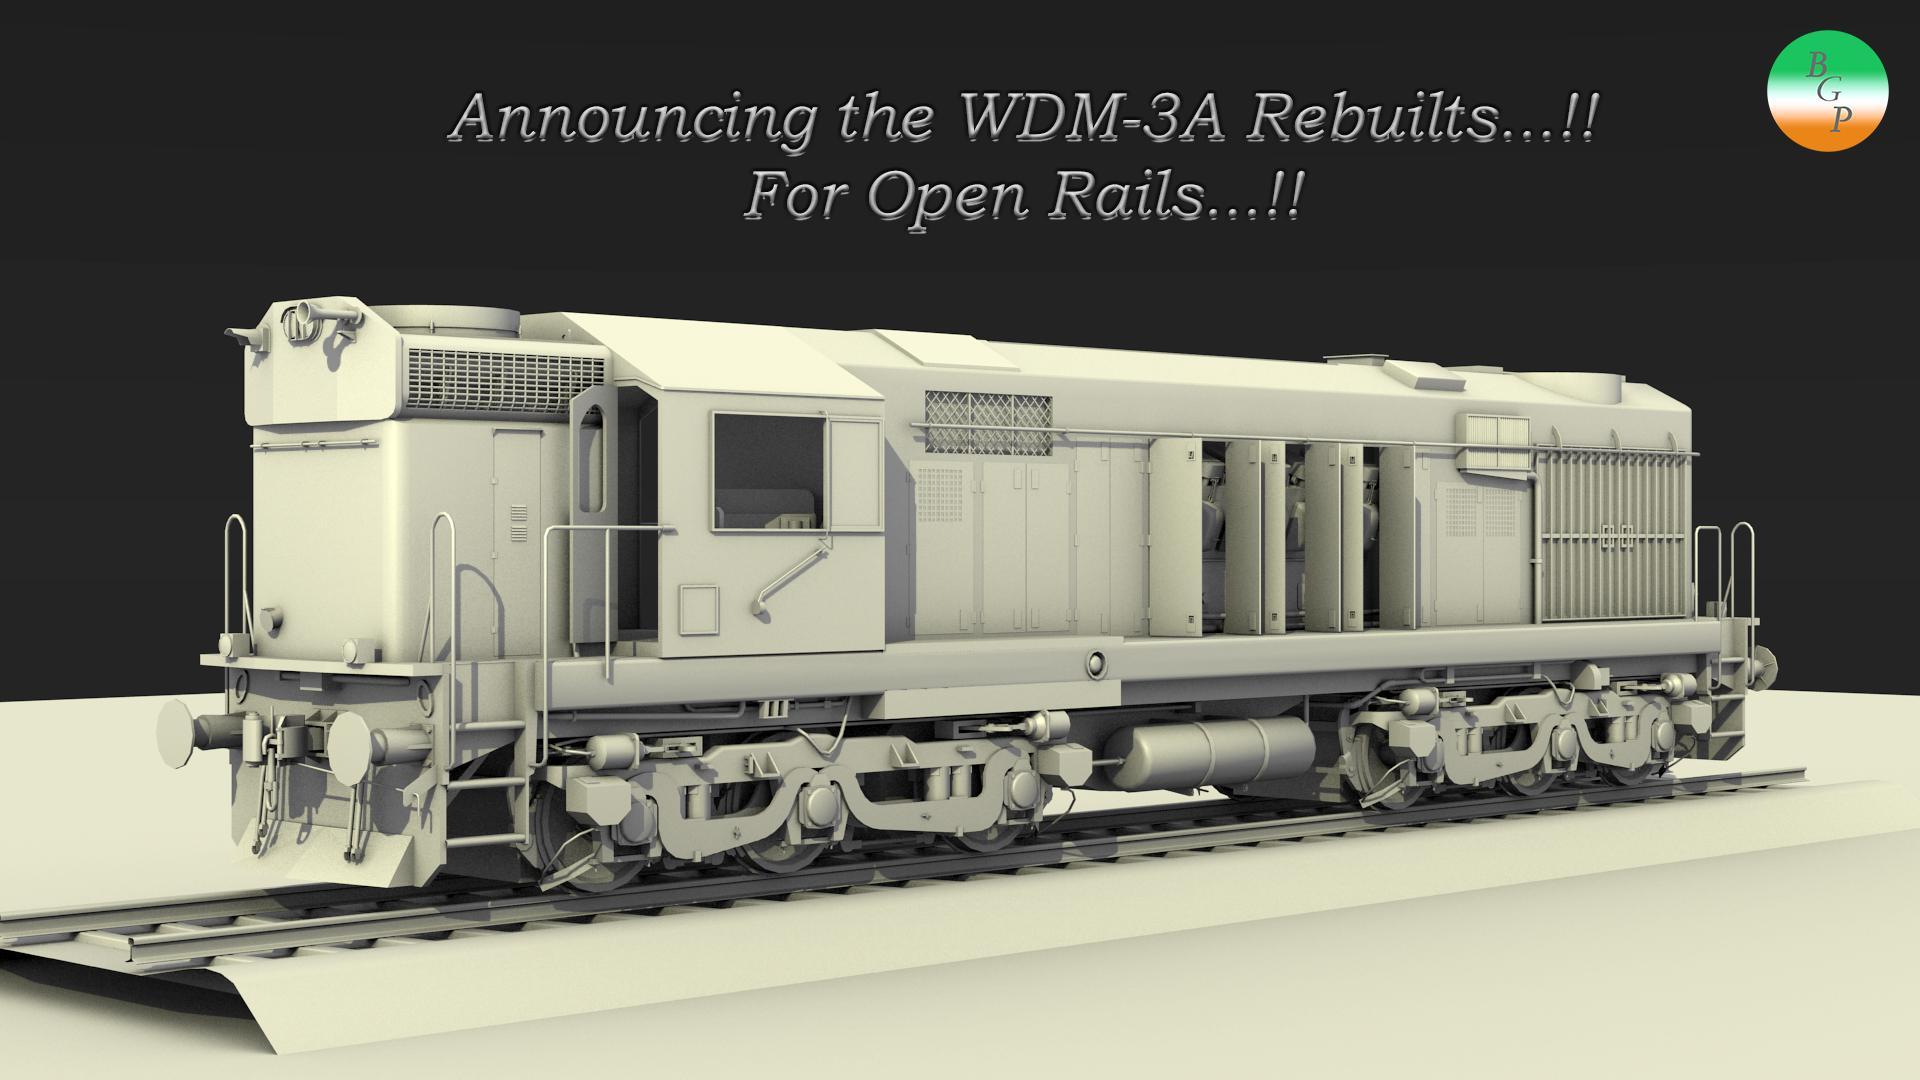 New Locomotive for Open Rails : WDM-3A Rebuilt